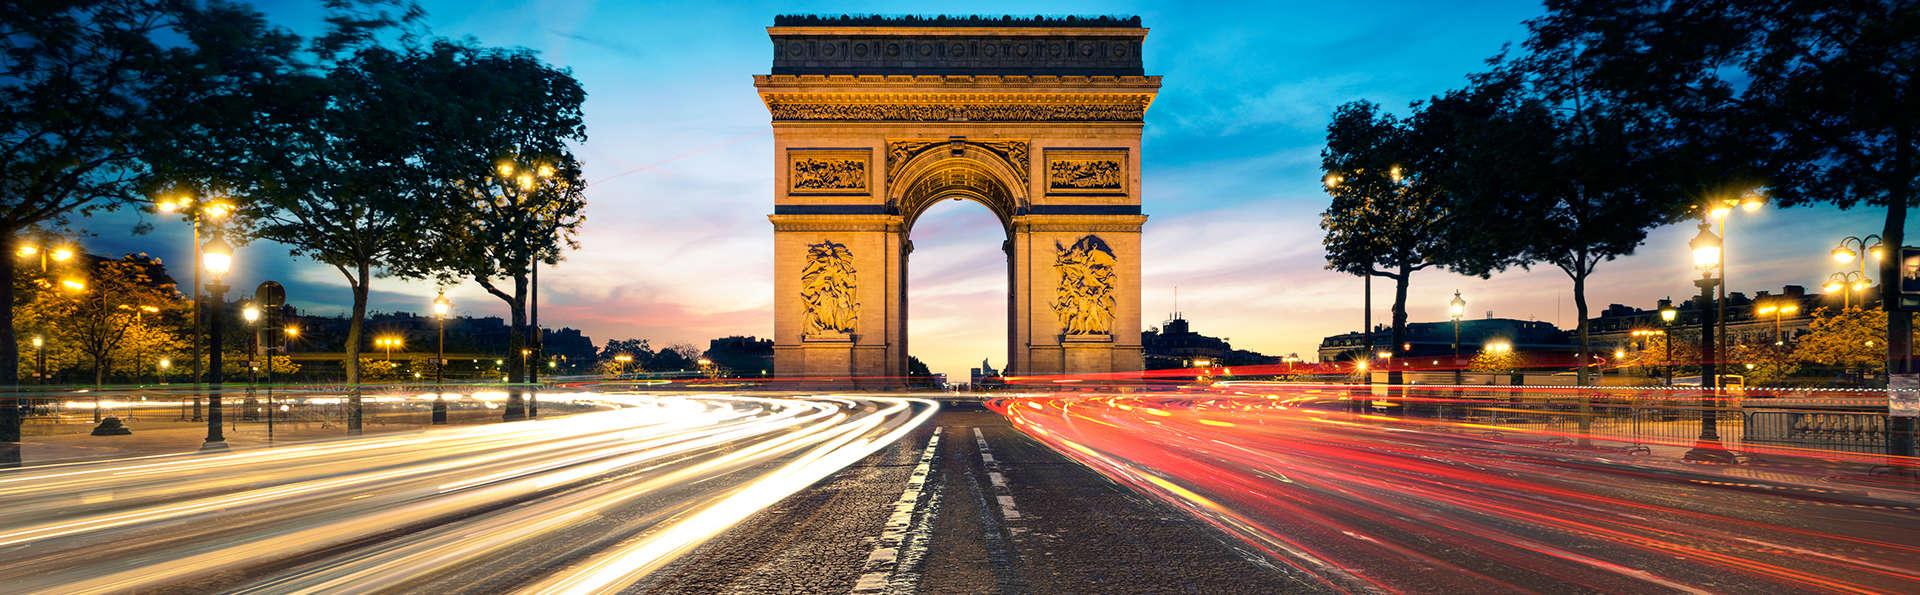 Chouette Hotel - Edit_Paris3.jpg